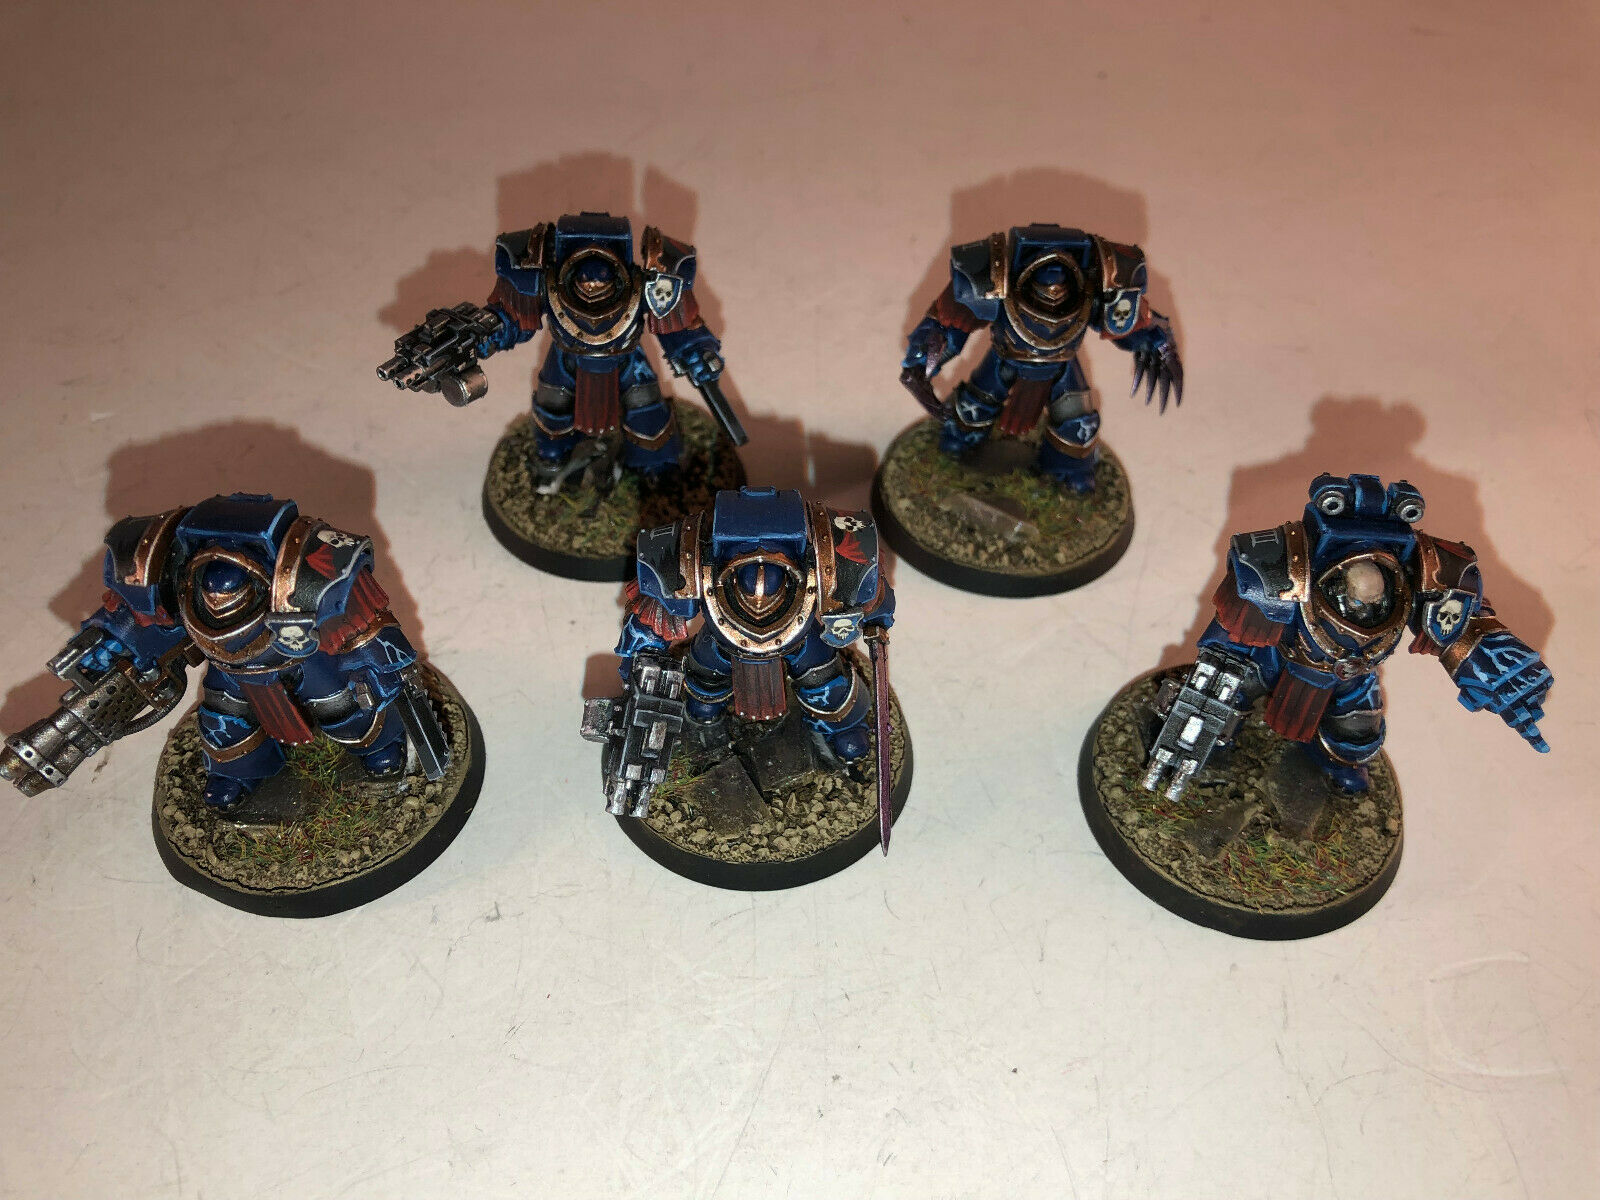 Warhammer 40000 40k Chaos Space Marines Cataphractii Terminators painted 9 10